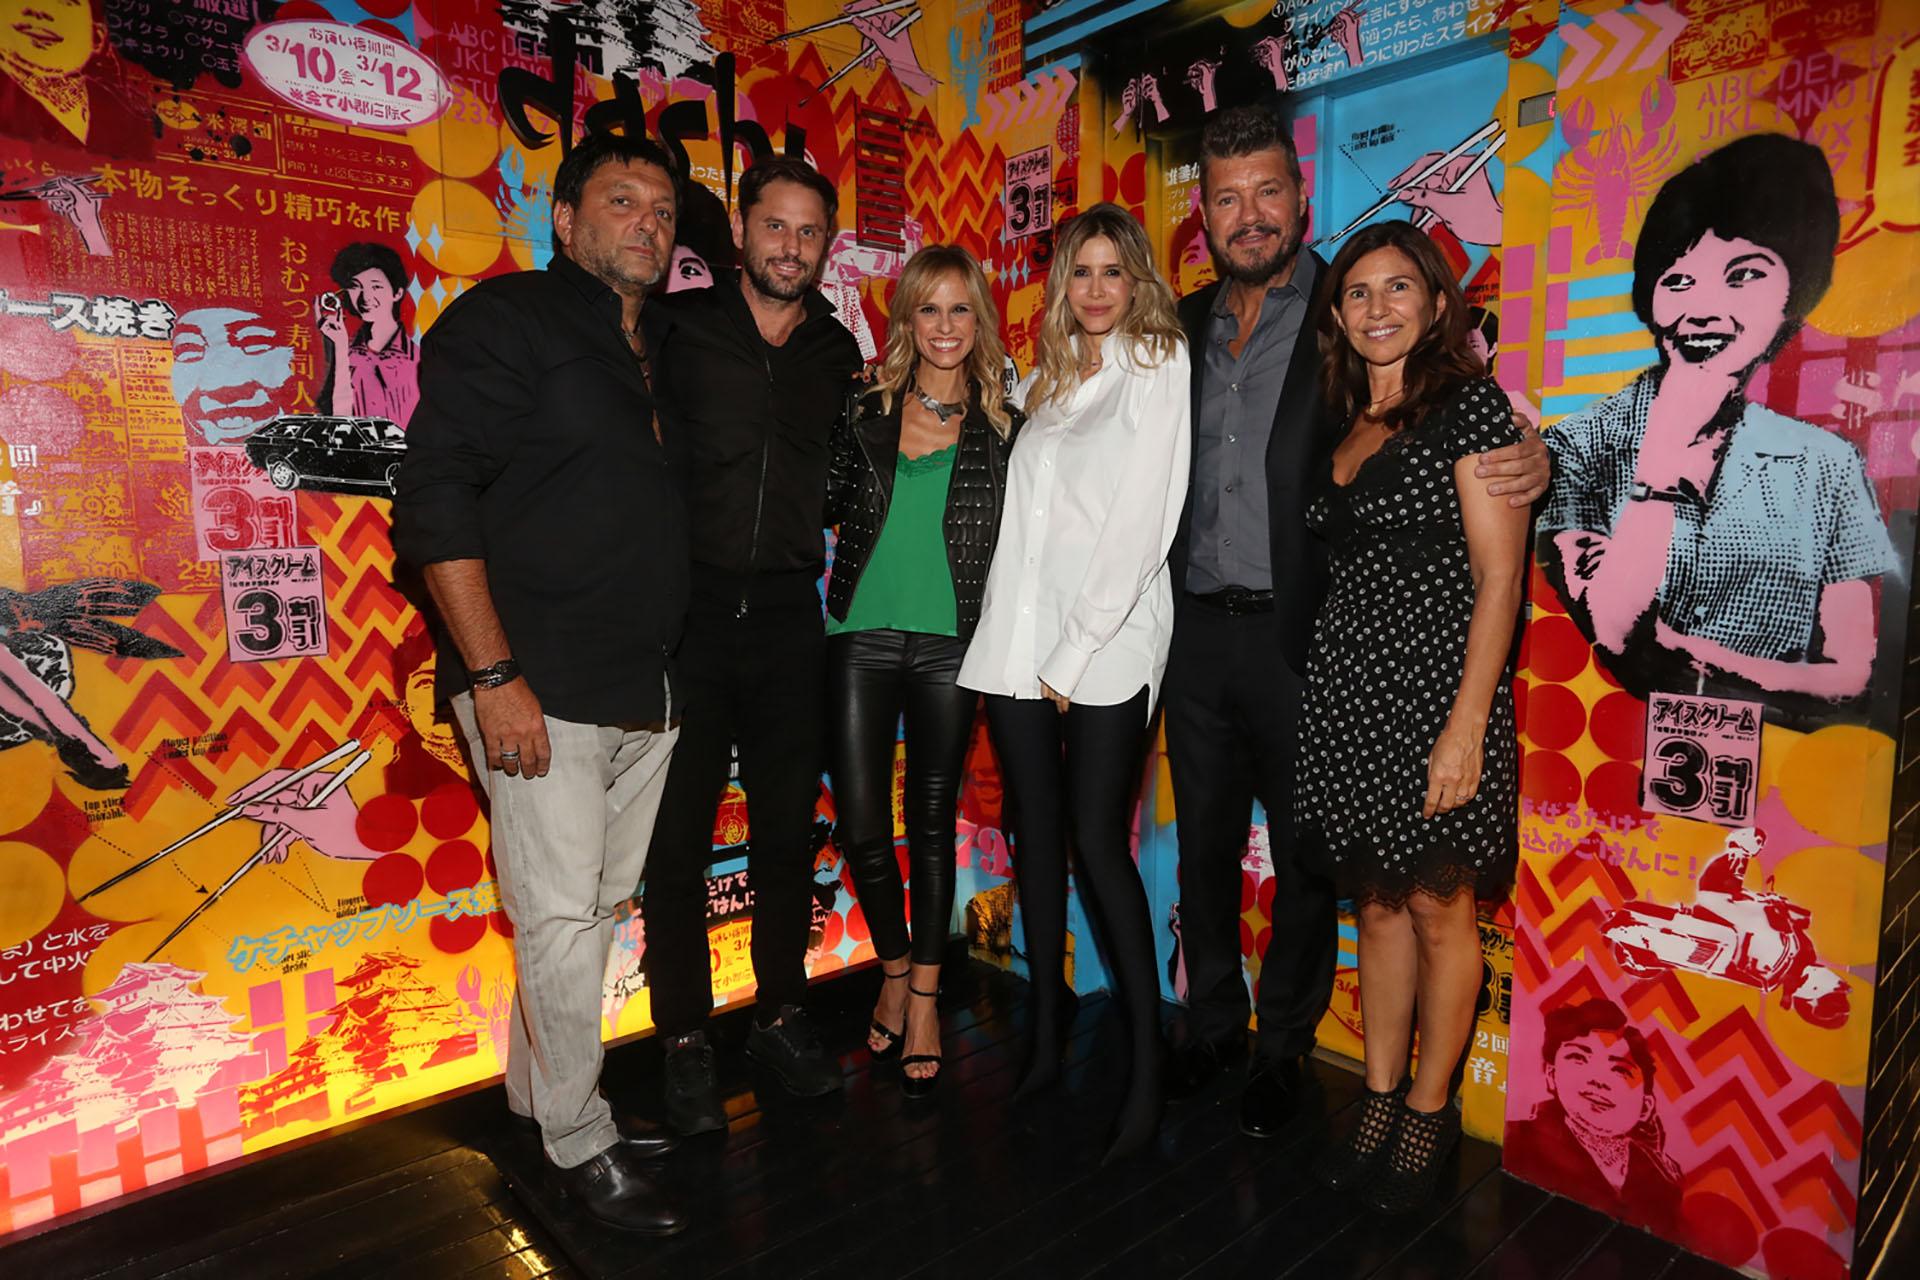 Gabriel Hochbaum y su mujer Calu junto a Mariano Chihade, Mariana Fabbiani, Guillermina Valdes y Marcelo Tinelli